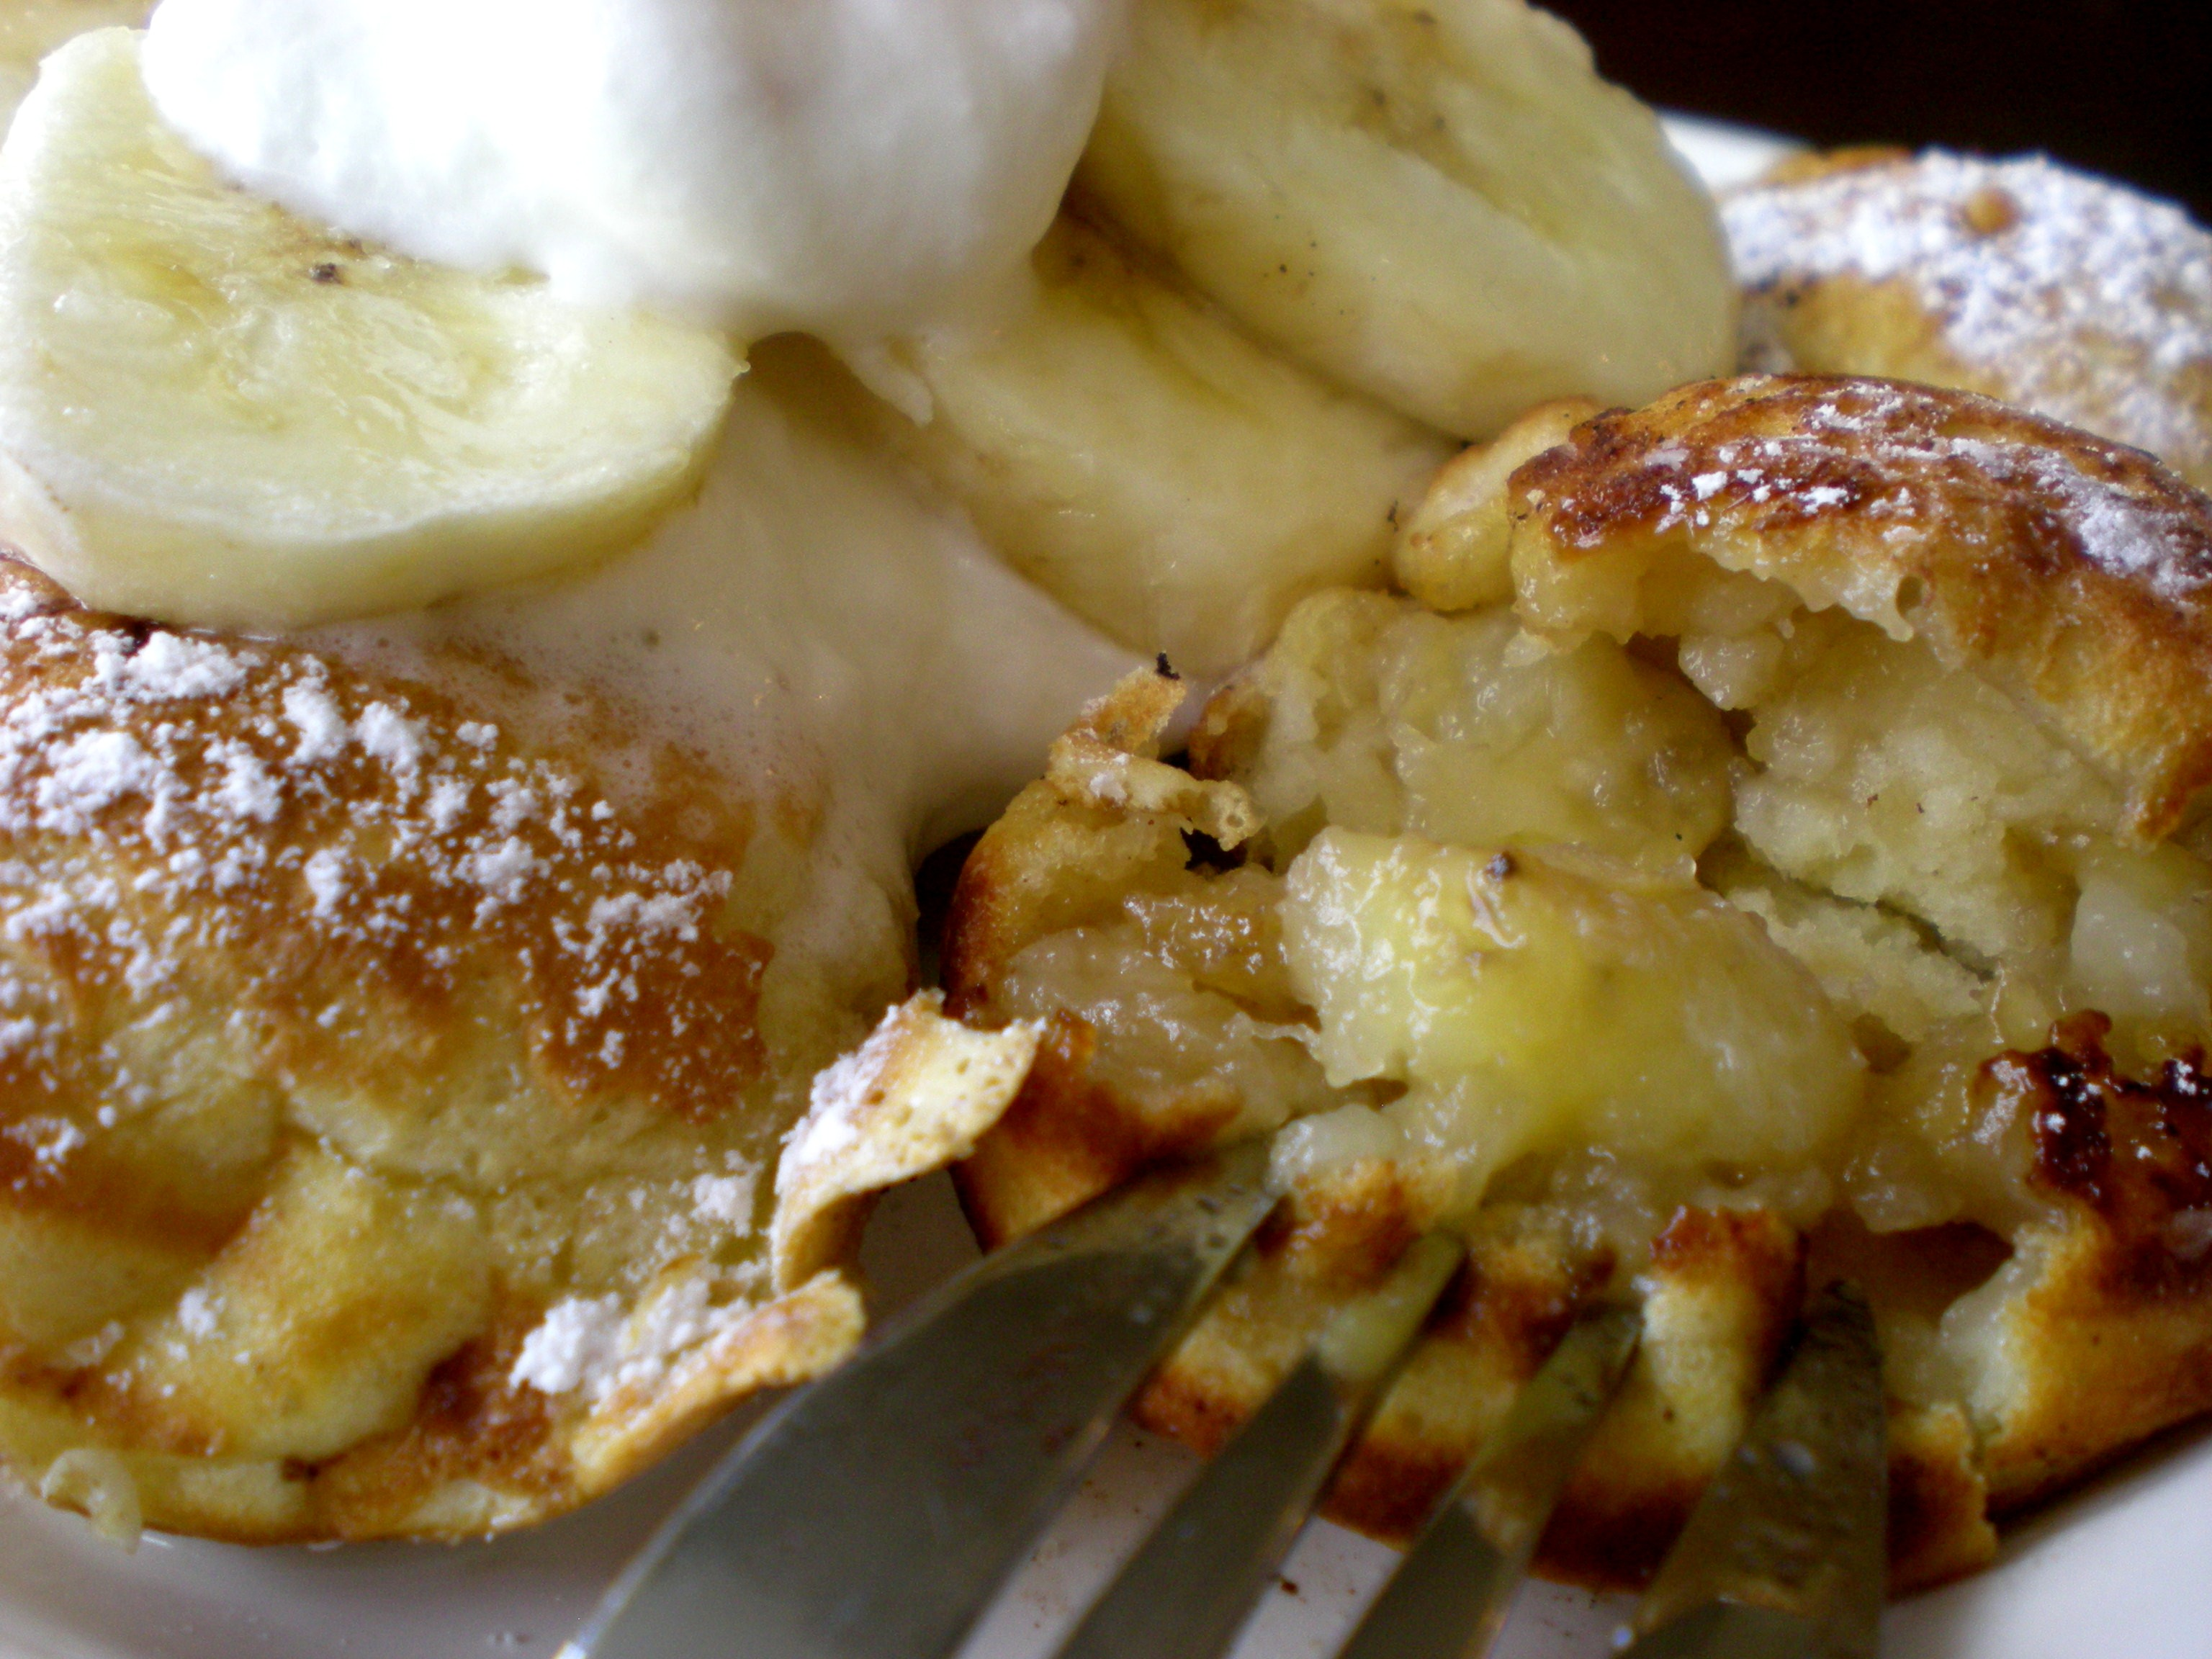 This Pancake Won't Fall Flat | The Spinning Plate